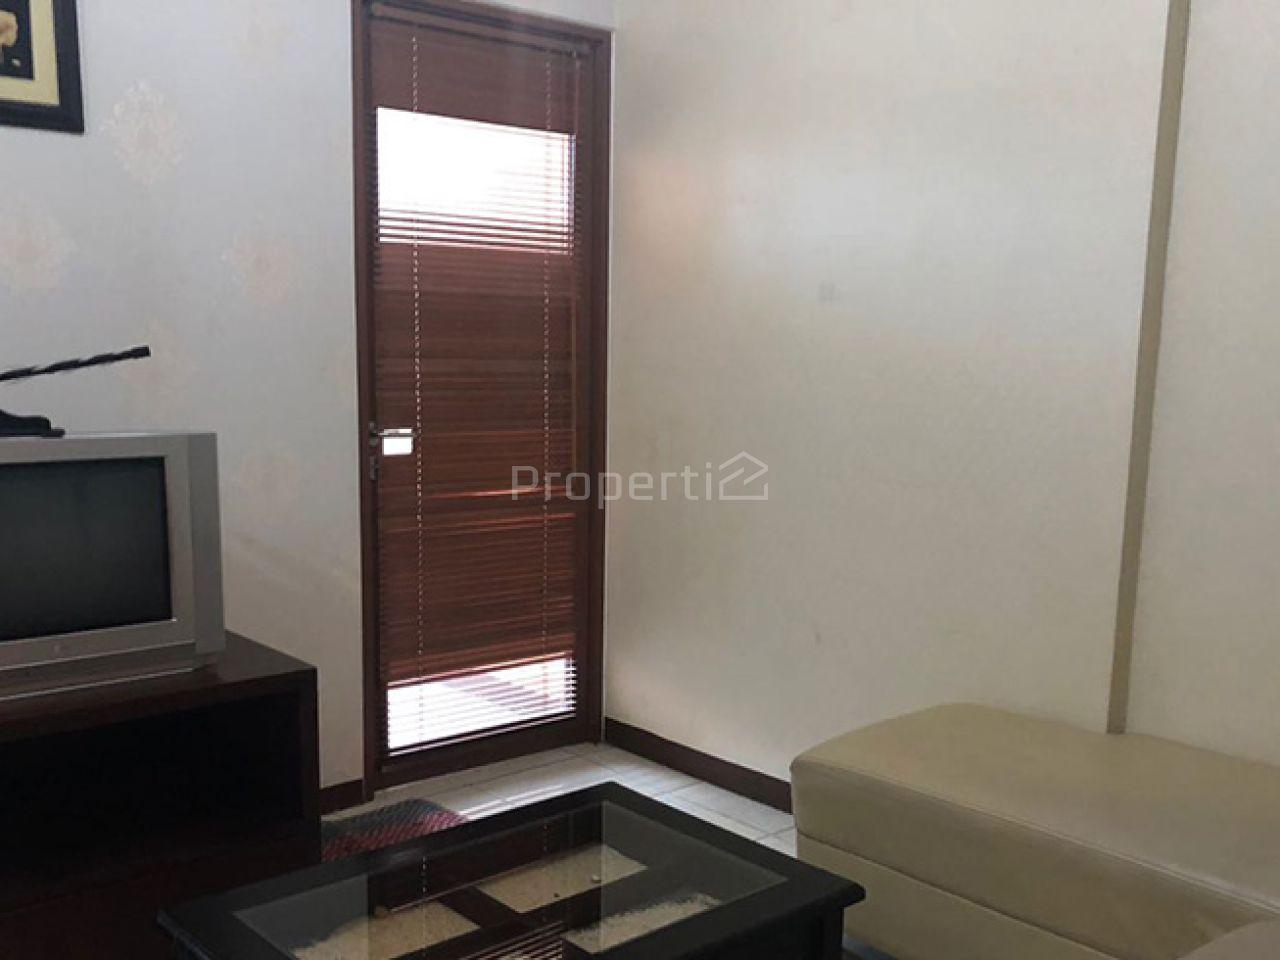 2BR Apartment Unit at Grand Setiabudi, 18th Floor, Jawa Barat